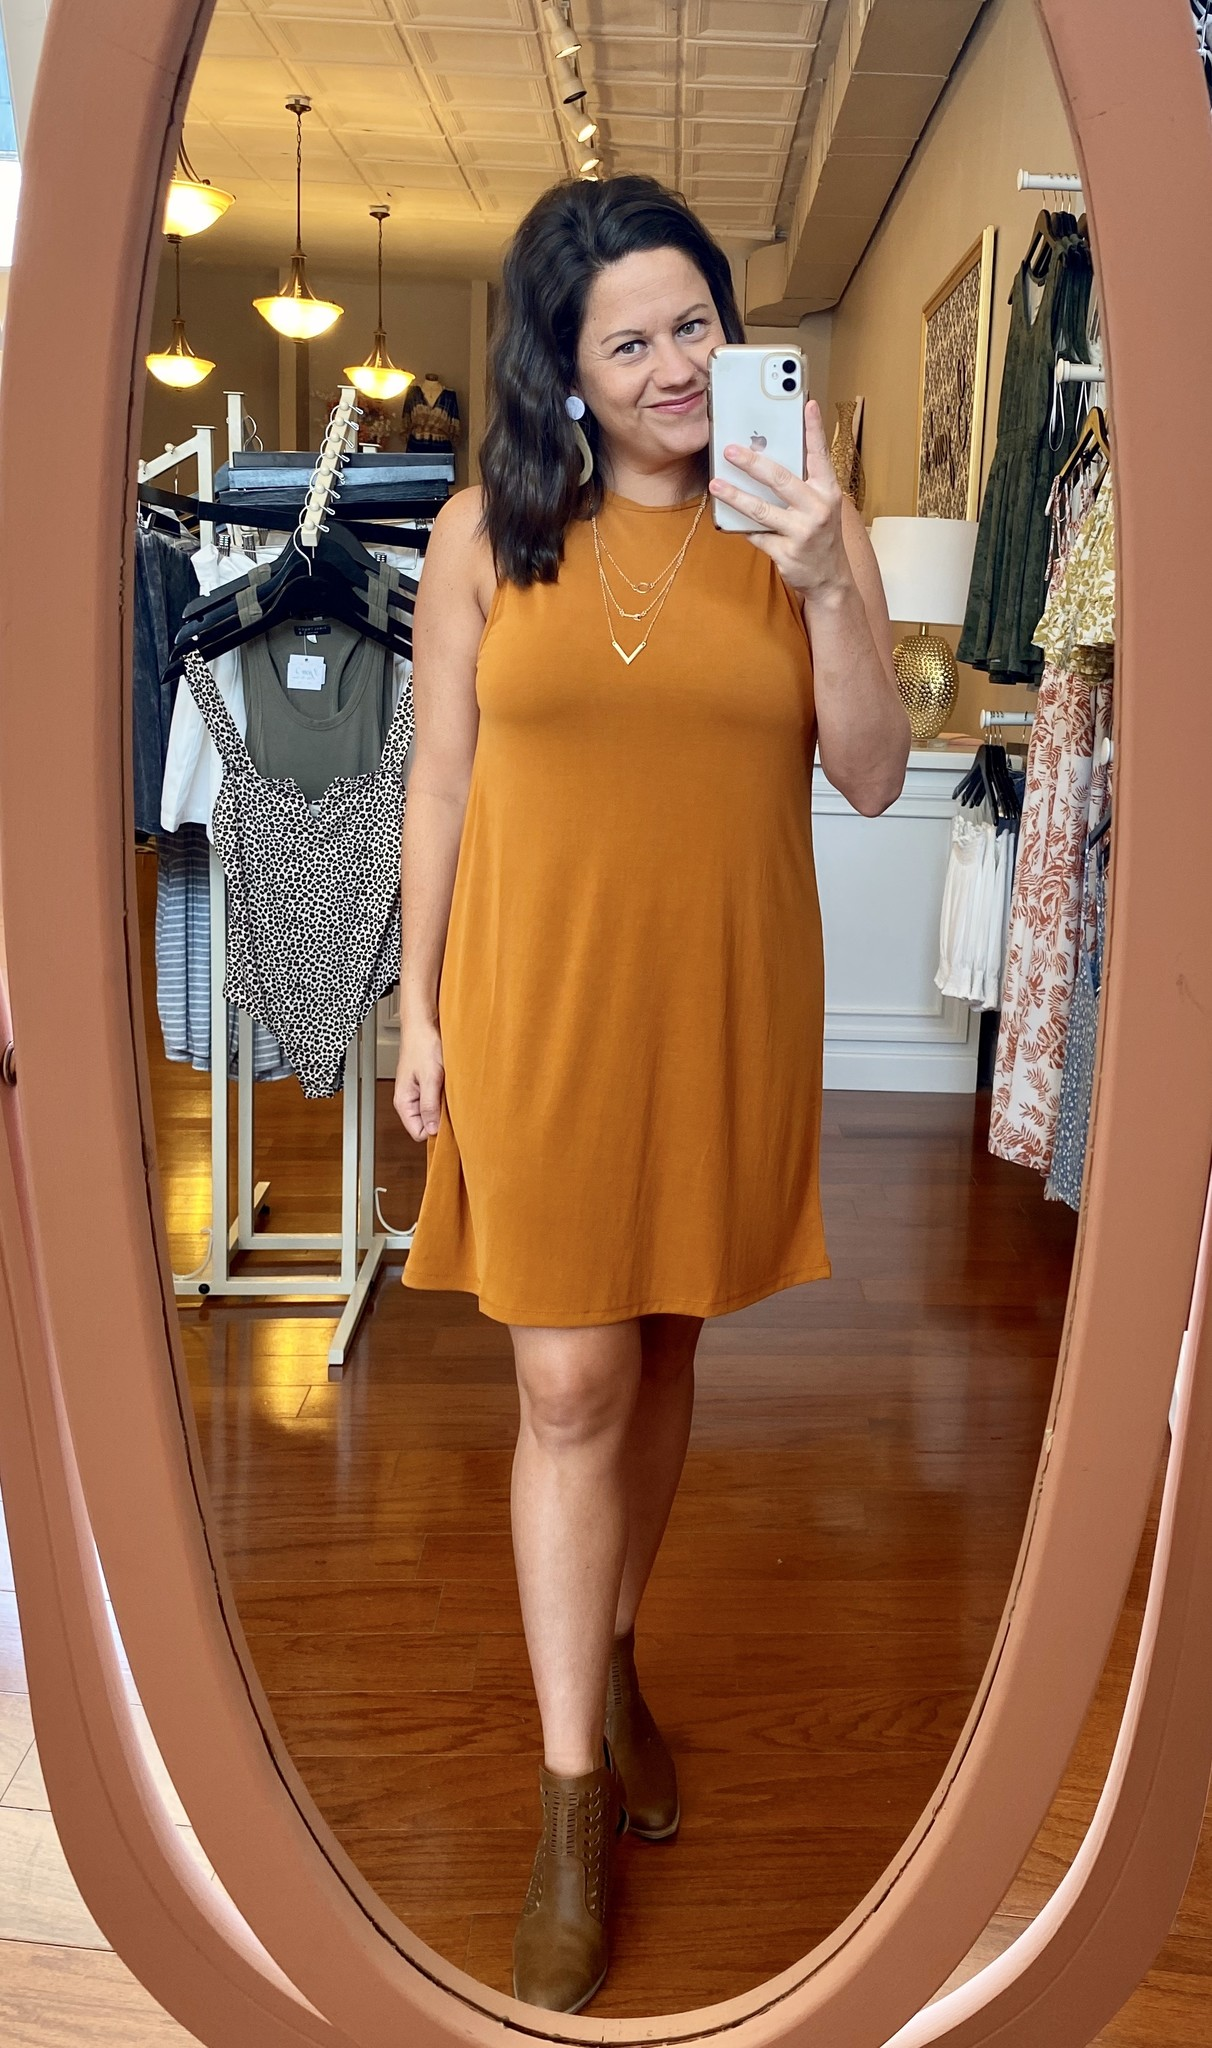 Hyfve Inc. Sleeveless Basic Tank Dress